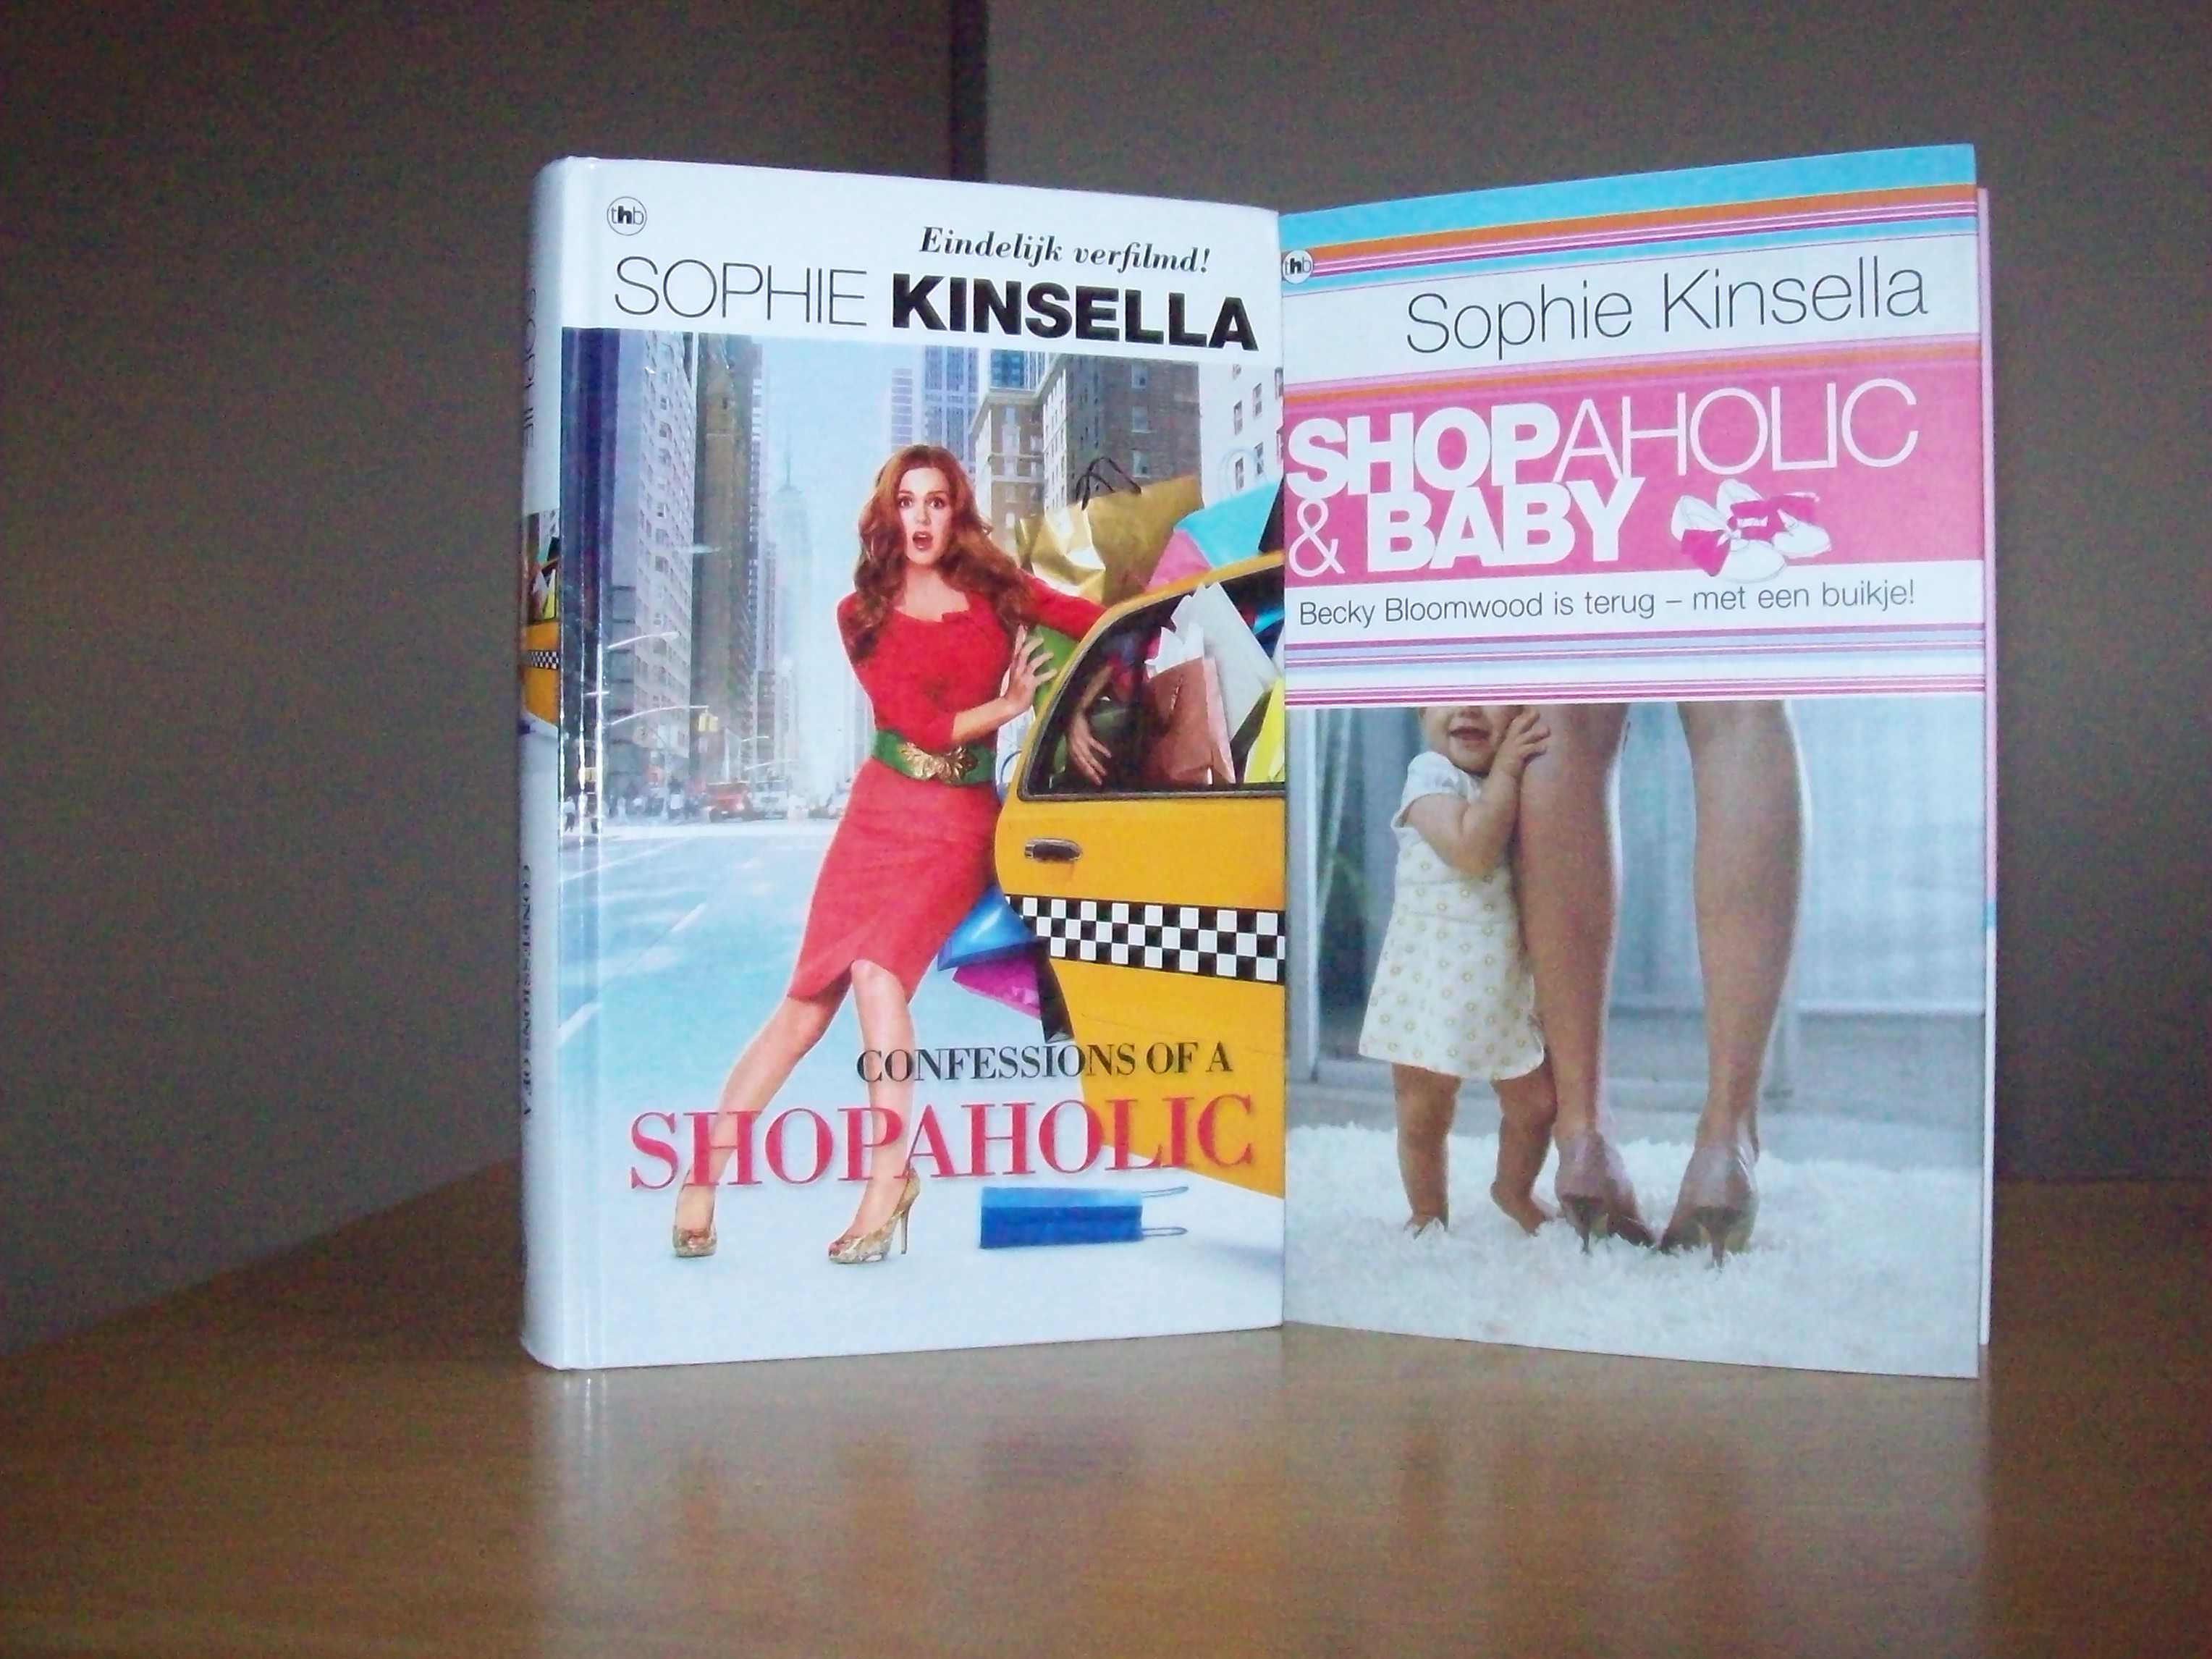 Shopaholic-boeken Sophie Kinsella